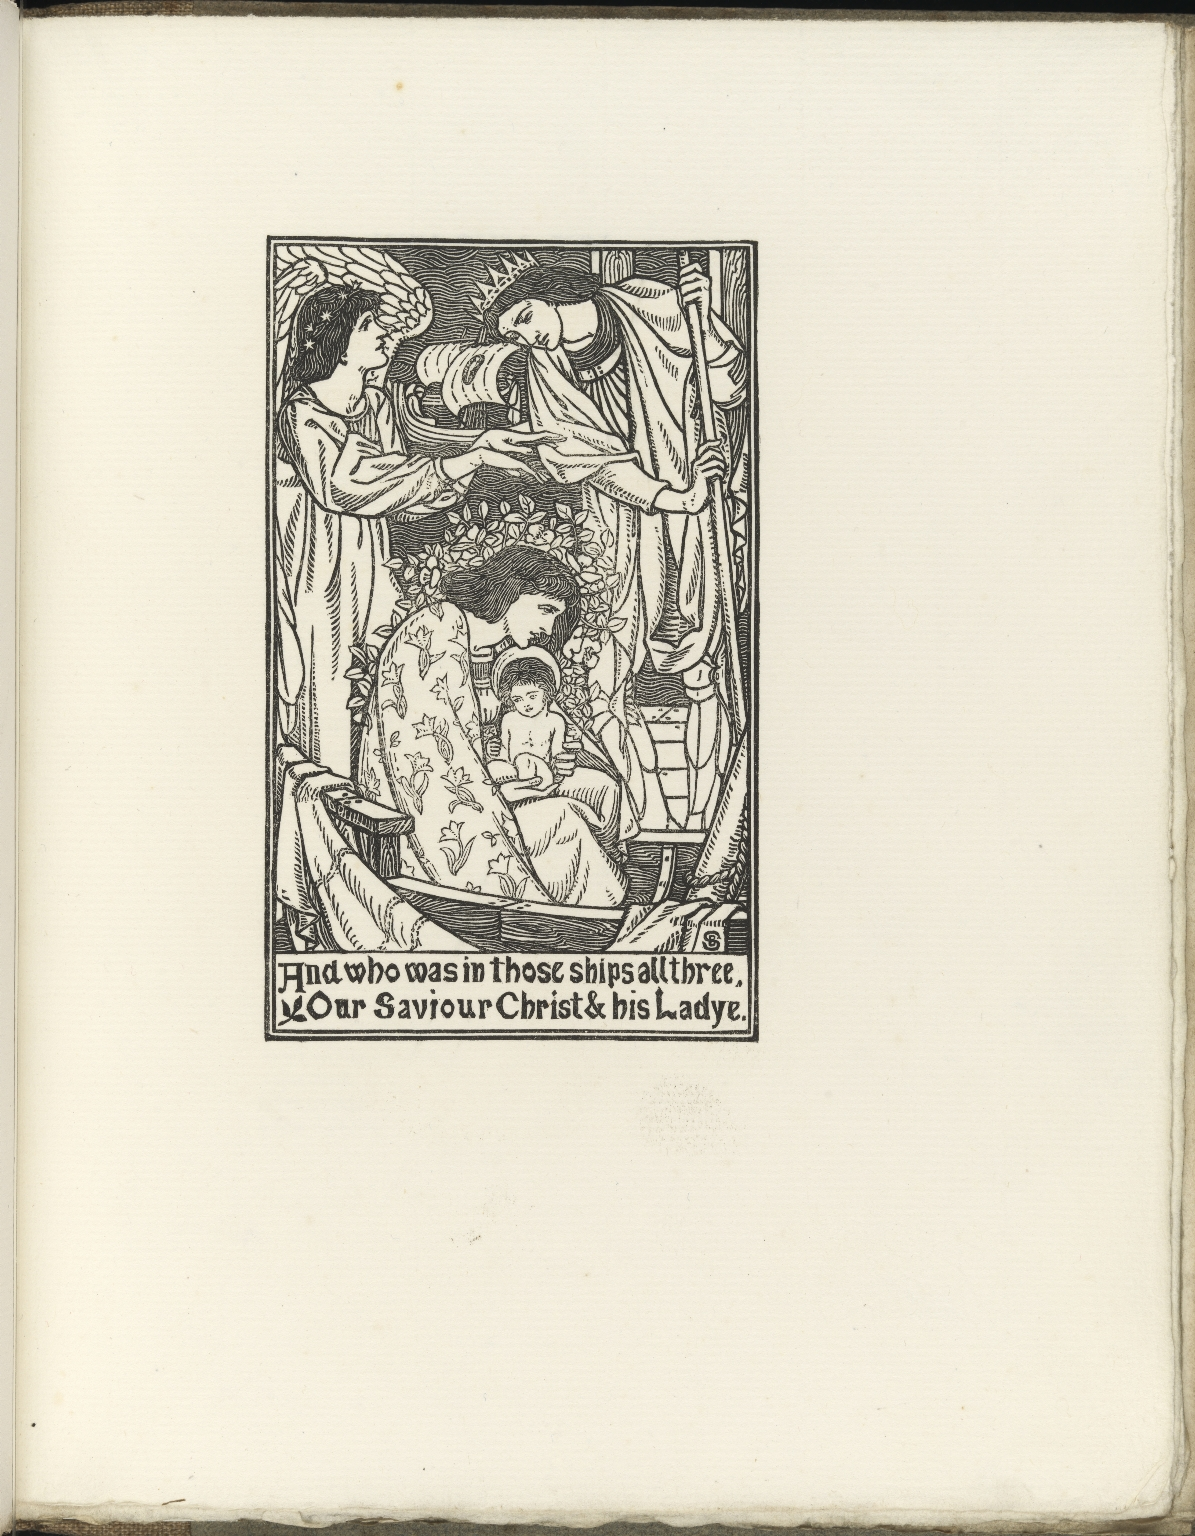 A Book of Pictured Carols, p.25